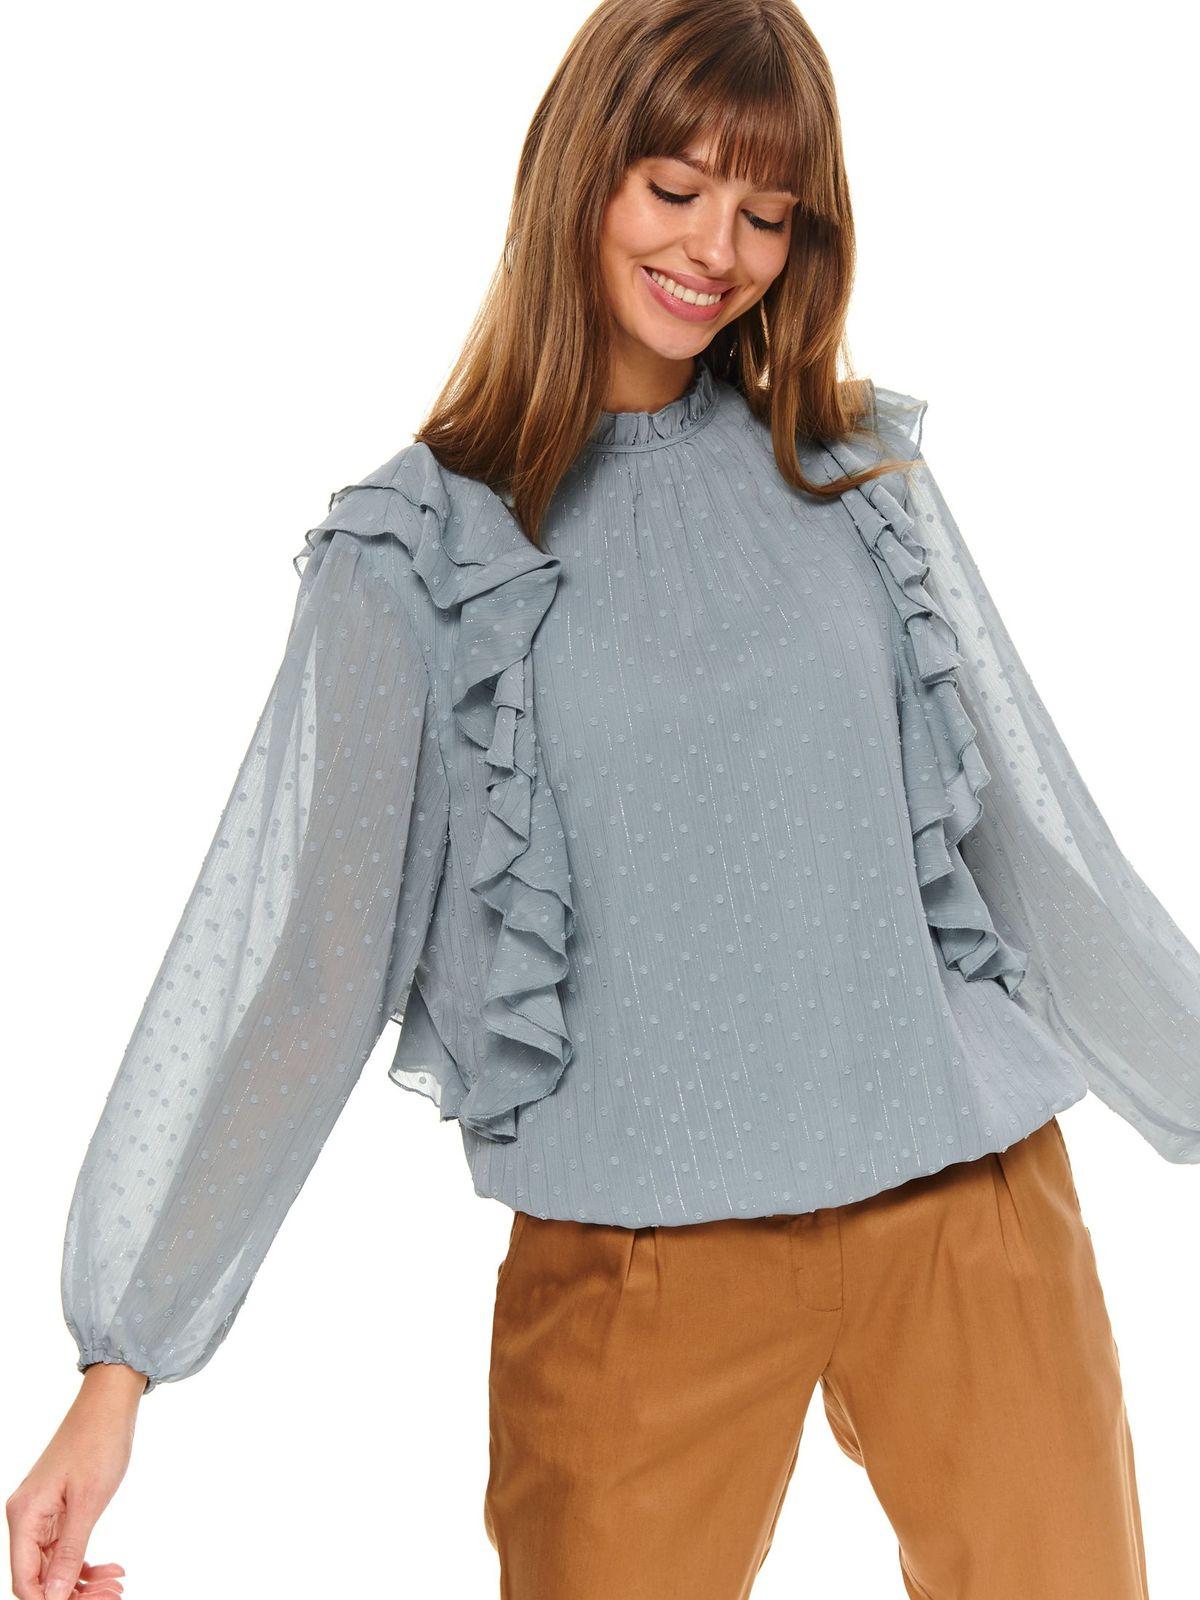 Bluza dama Top Secret verde casual cu croi larg cu guler cu volanase din material usor transparent